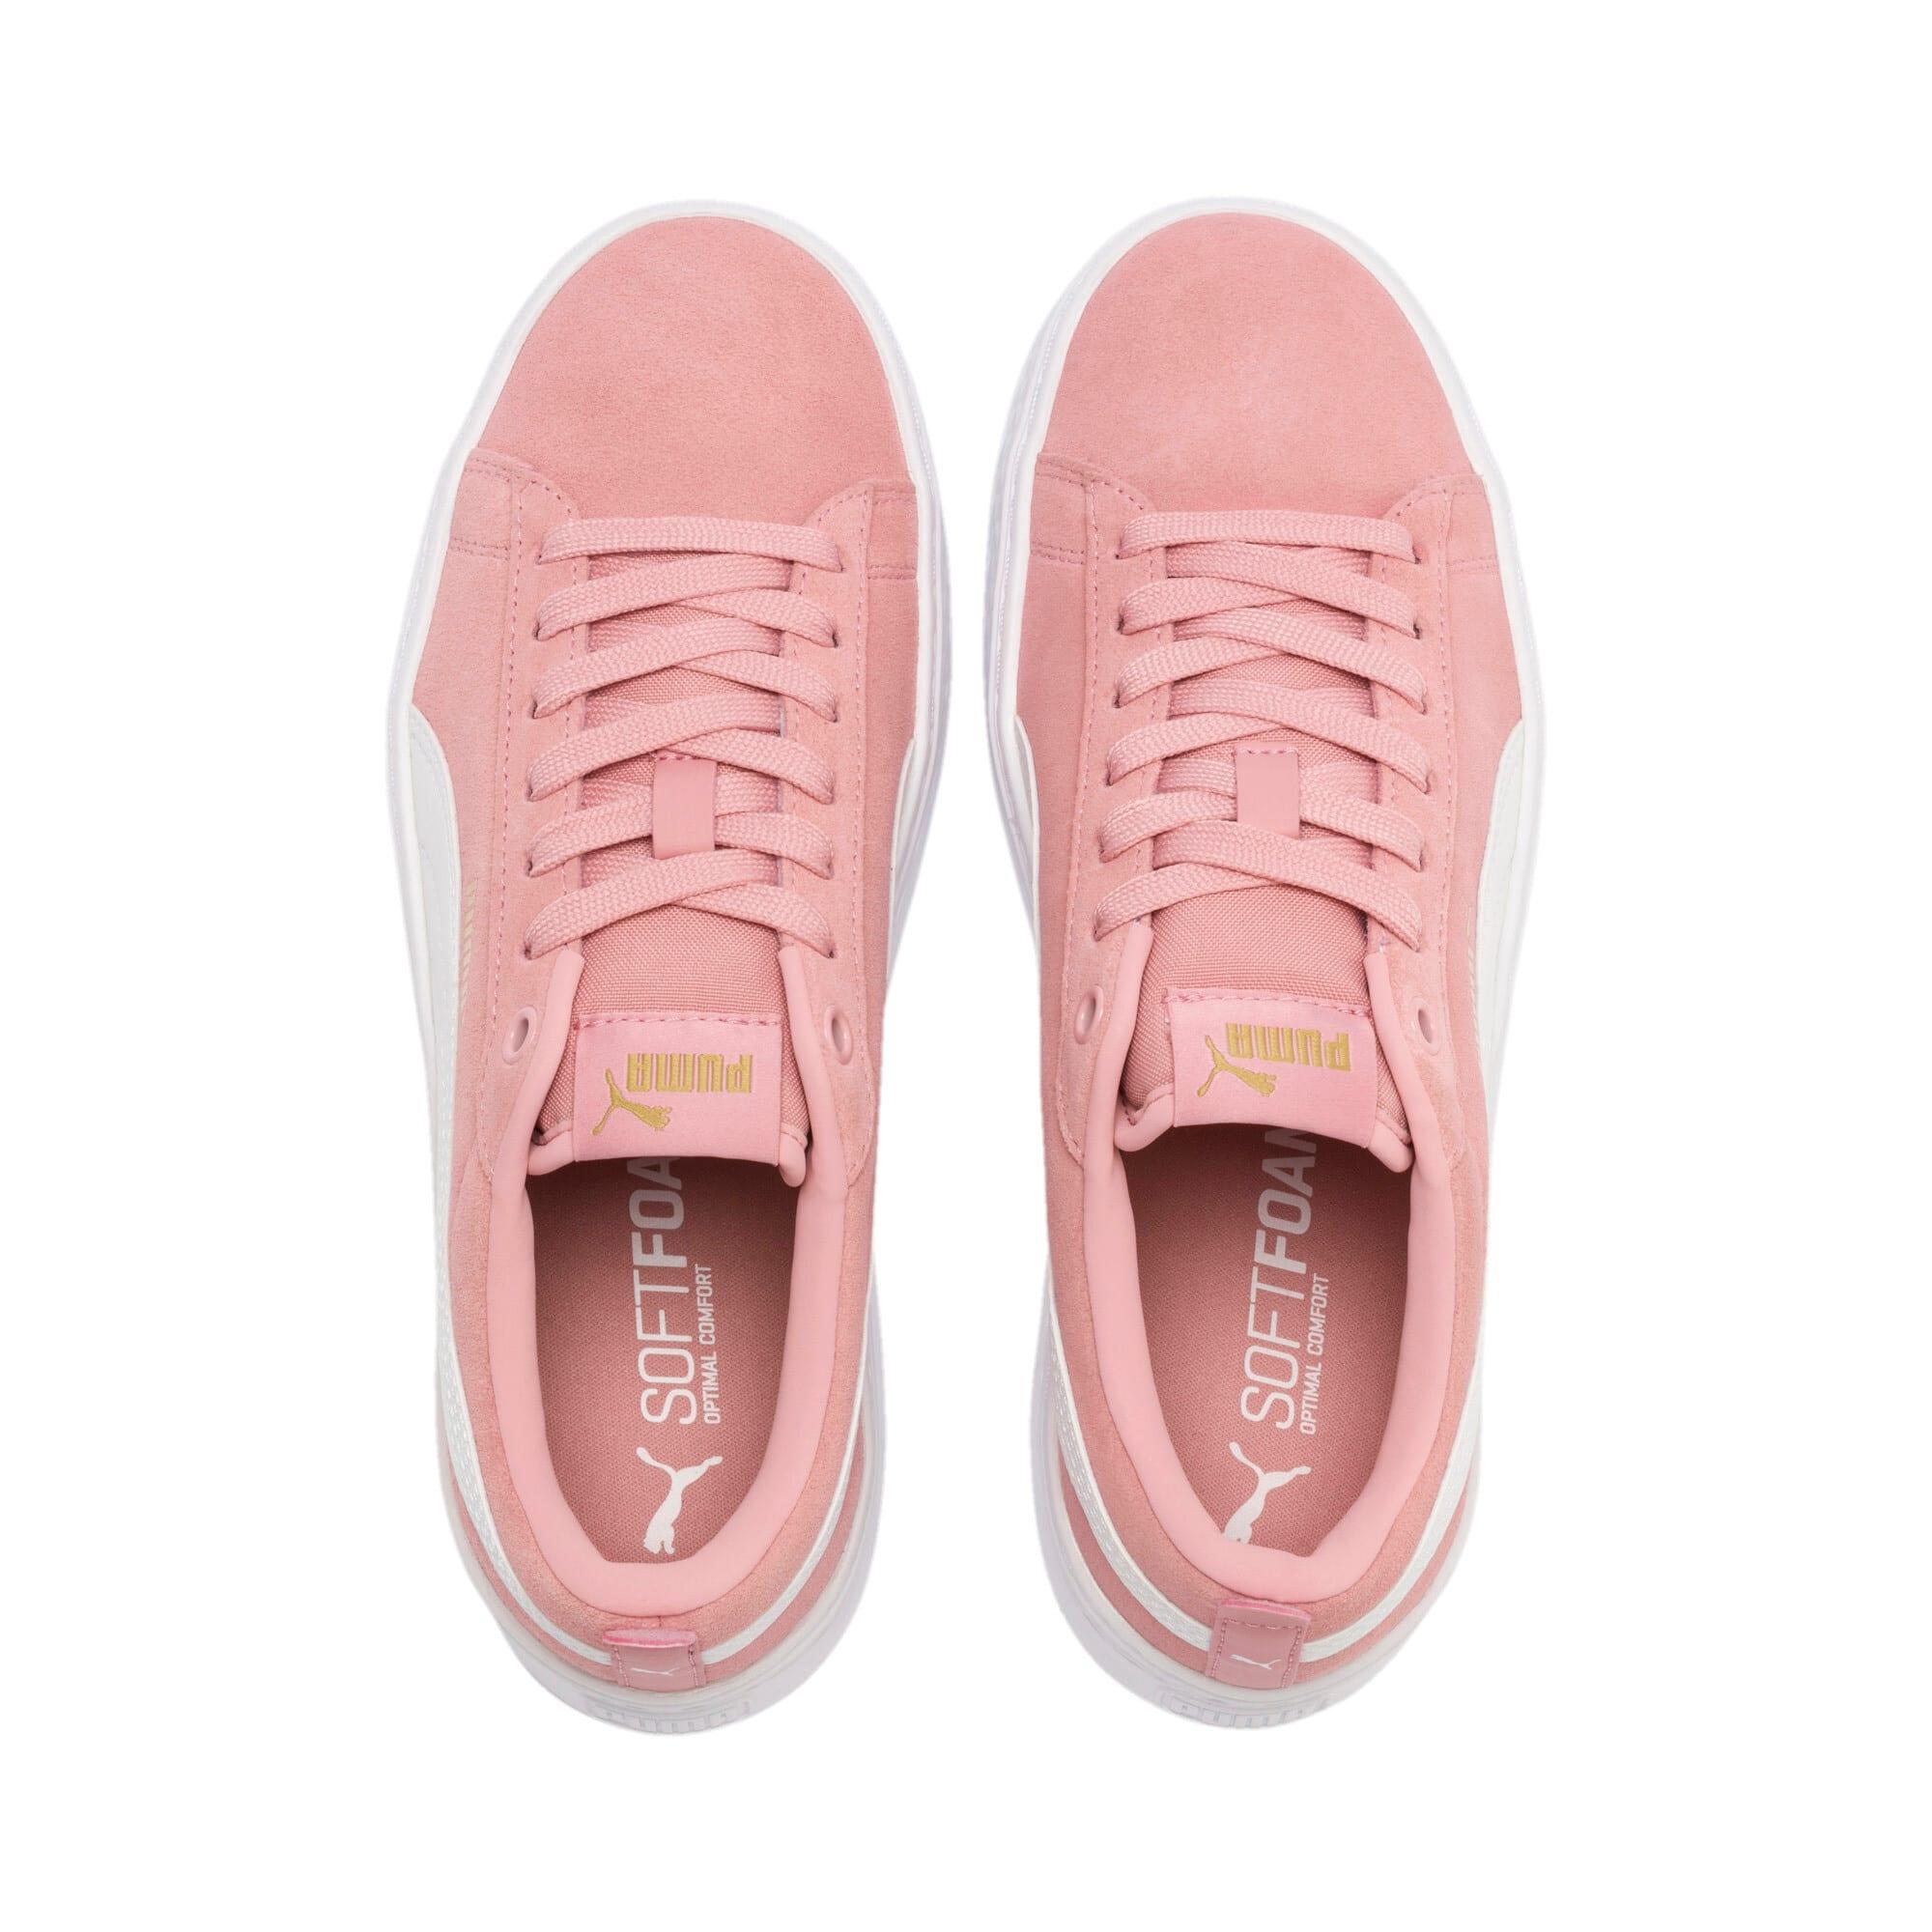 Thumbnail 7 of PUMA Smash Platform Suede Women's Sneakers, Bridal Rose-Puma White-Gold, medium